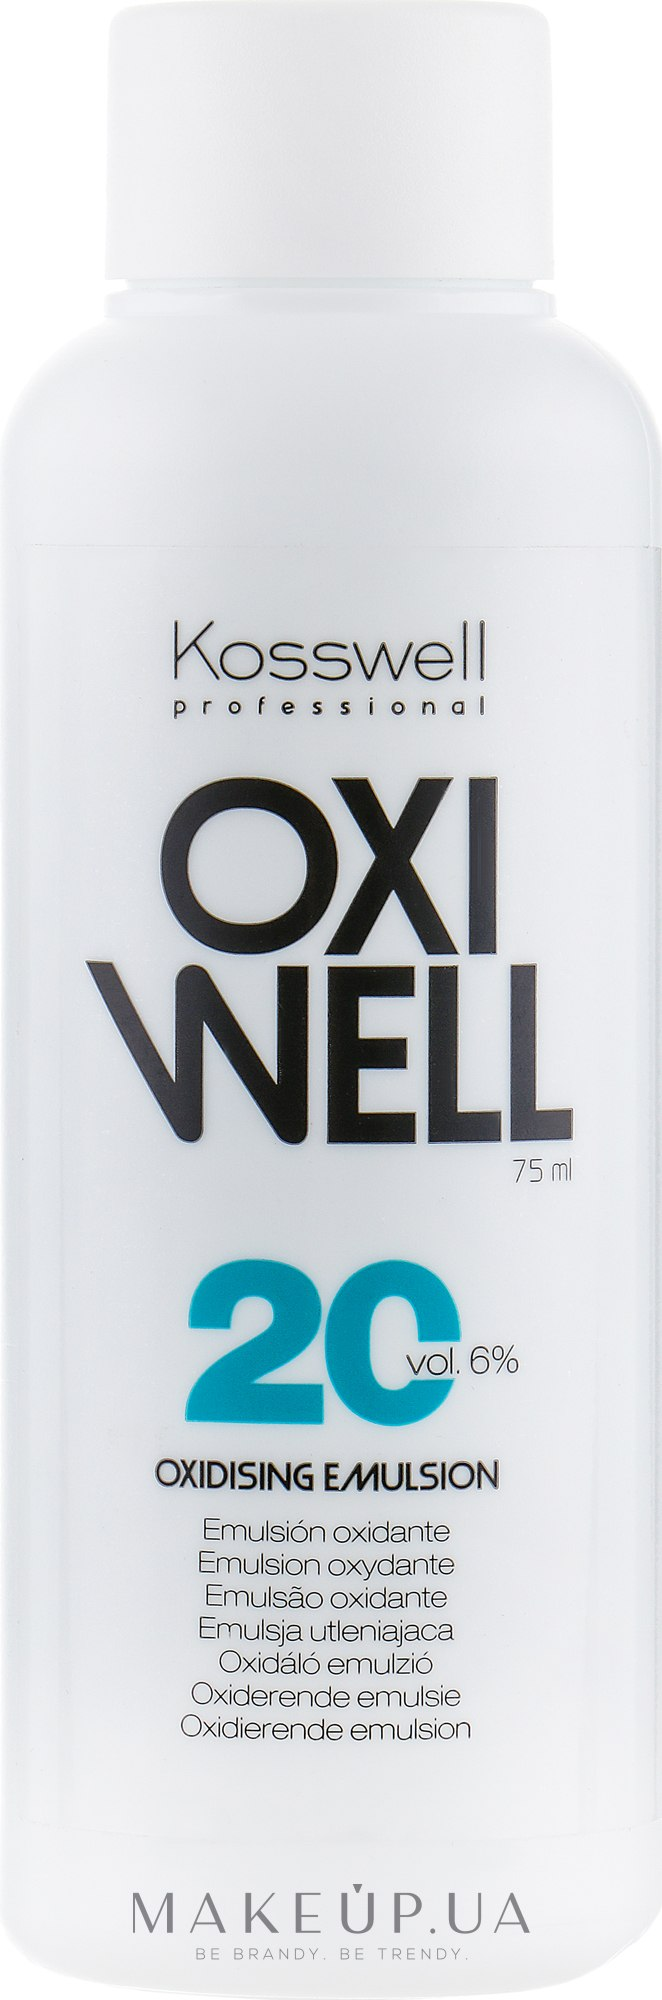 Окислительная эмульсия, 6% - Kosswell Professional Equium Oxidizing Emulsion Oxiwell 6% 20 vol — фото 75ml